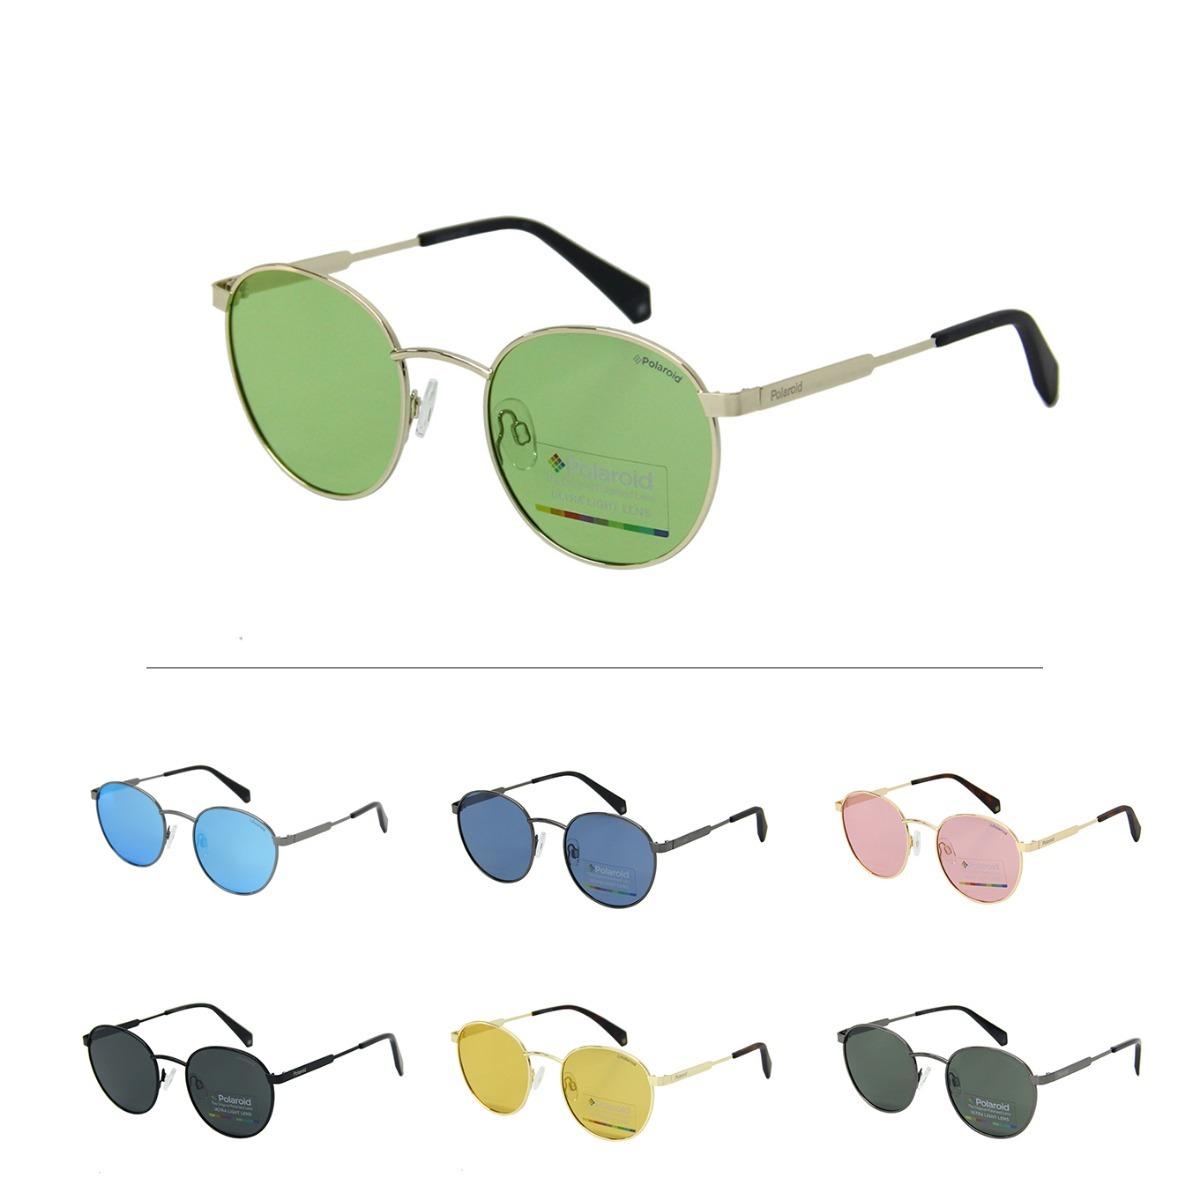 Óculos Solar Feminino Polaroid 2053 - R  169,00 em Mercado Livre 2fd2c015d5